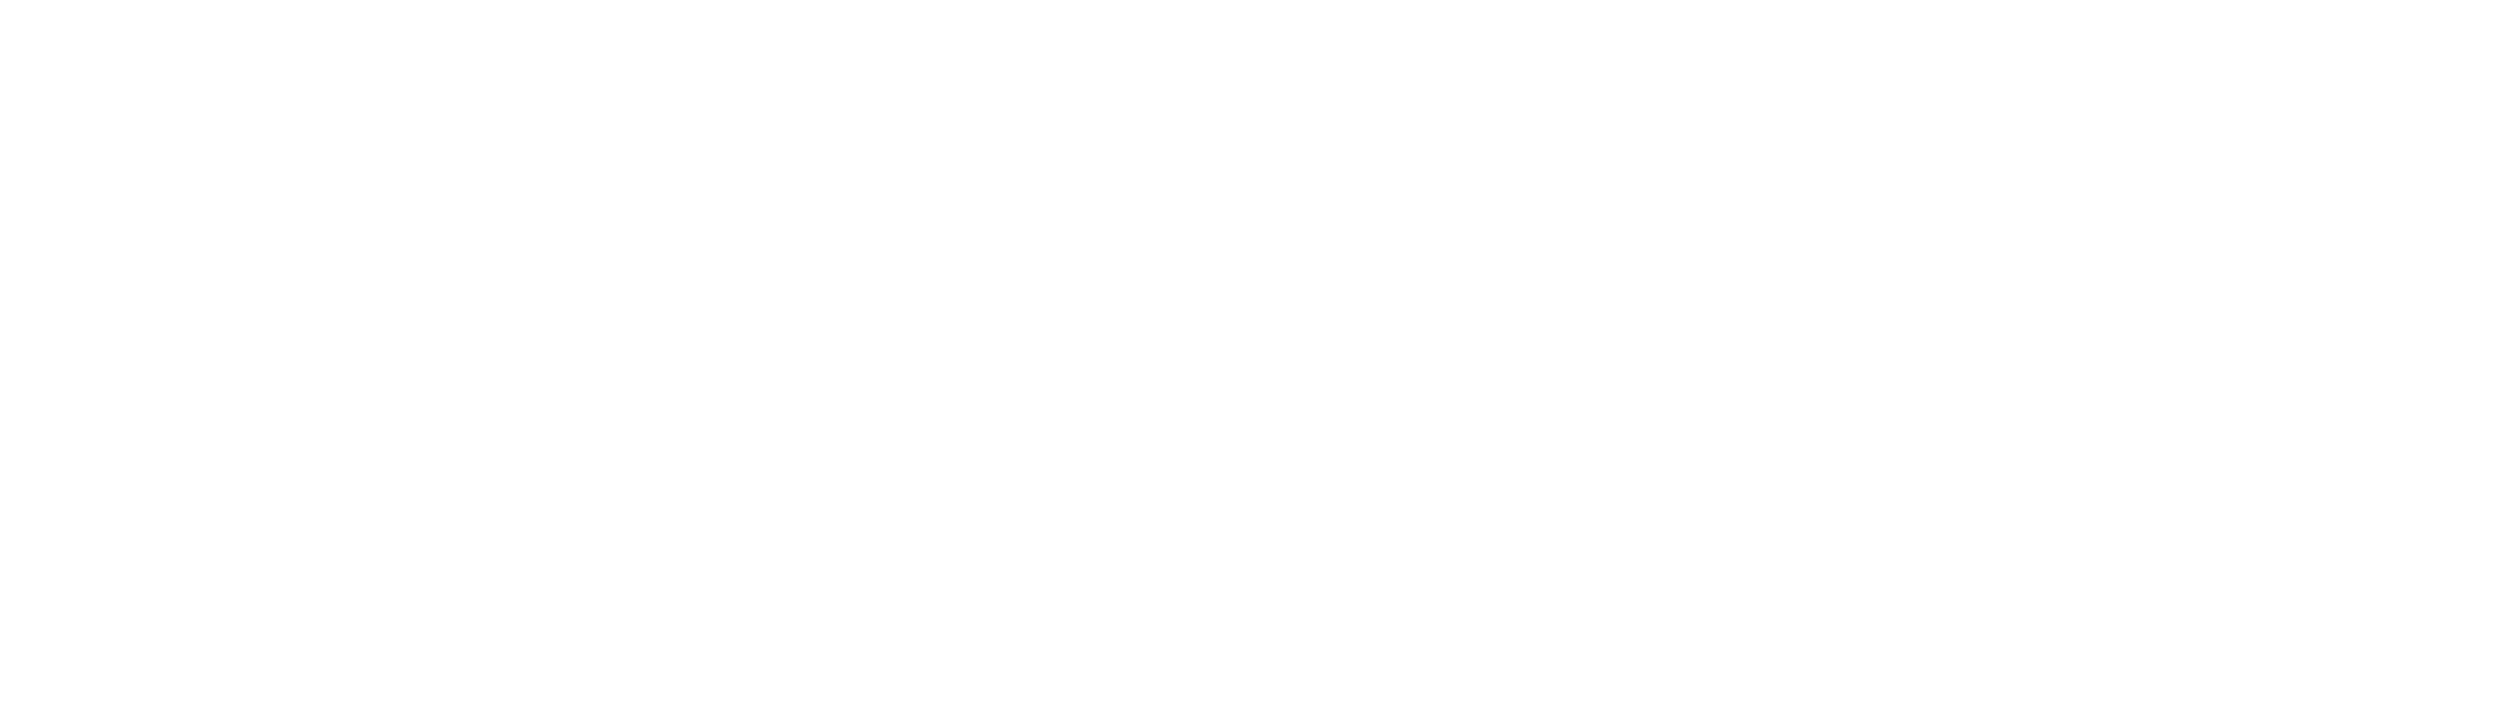 Tavaha_NEGATIV.png